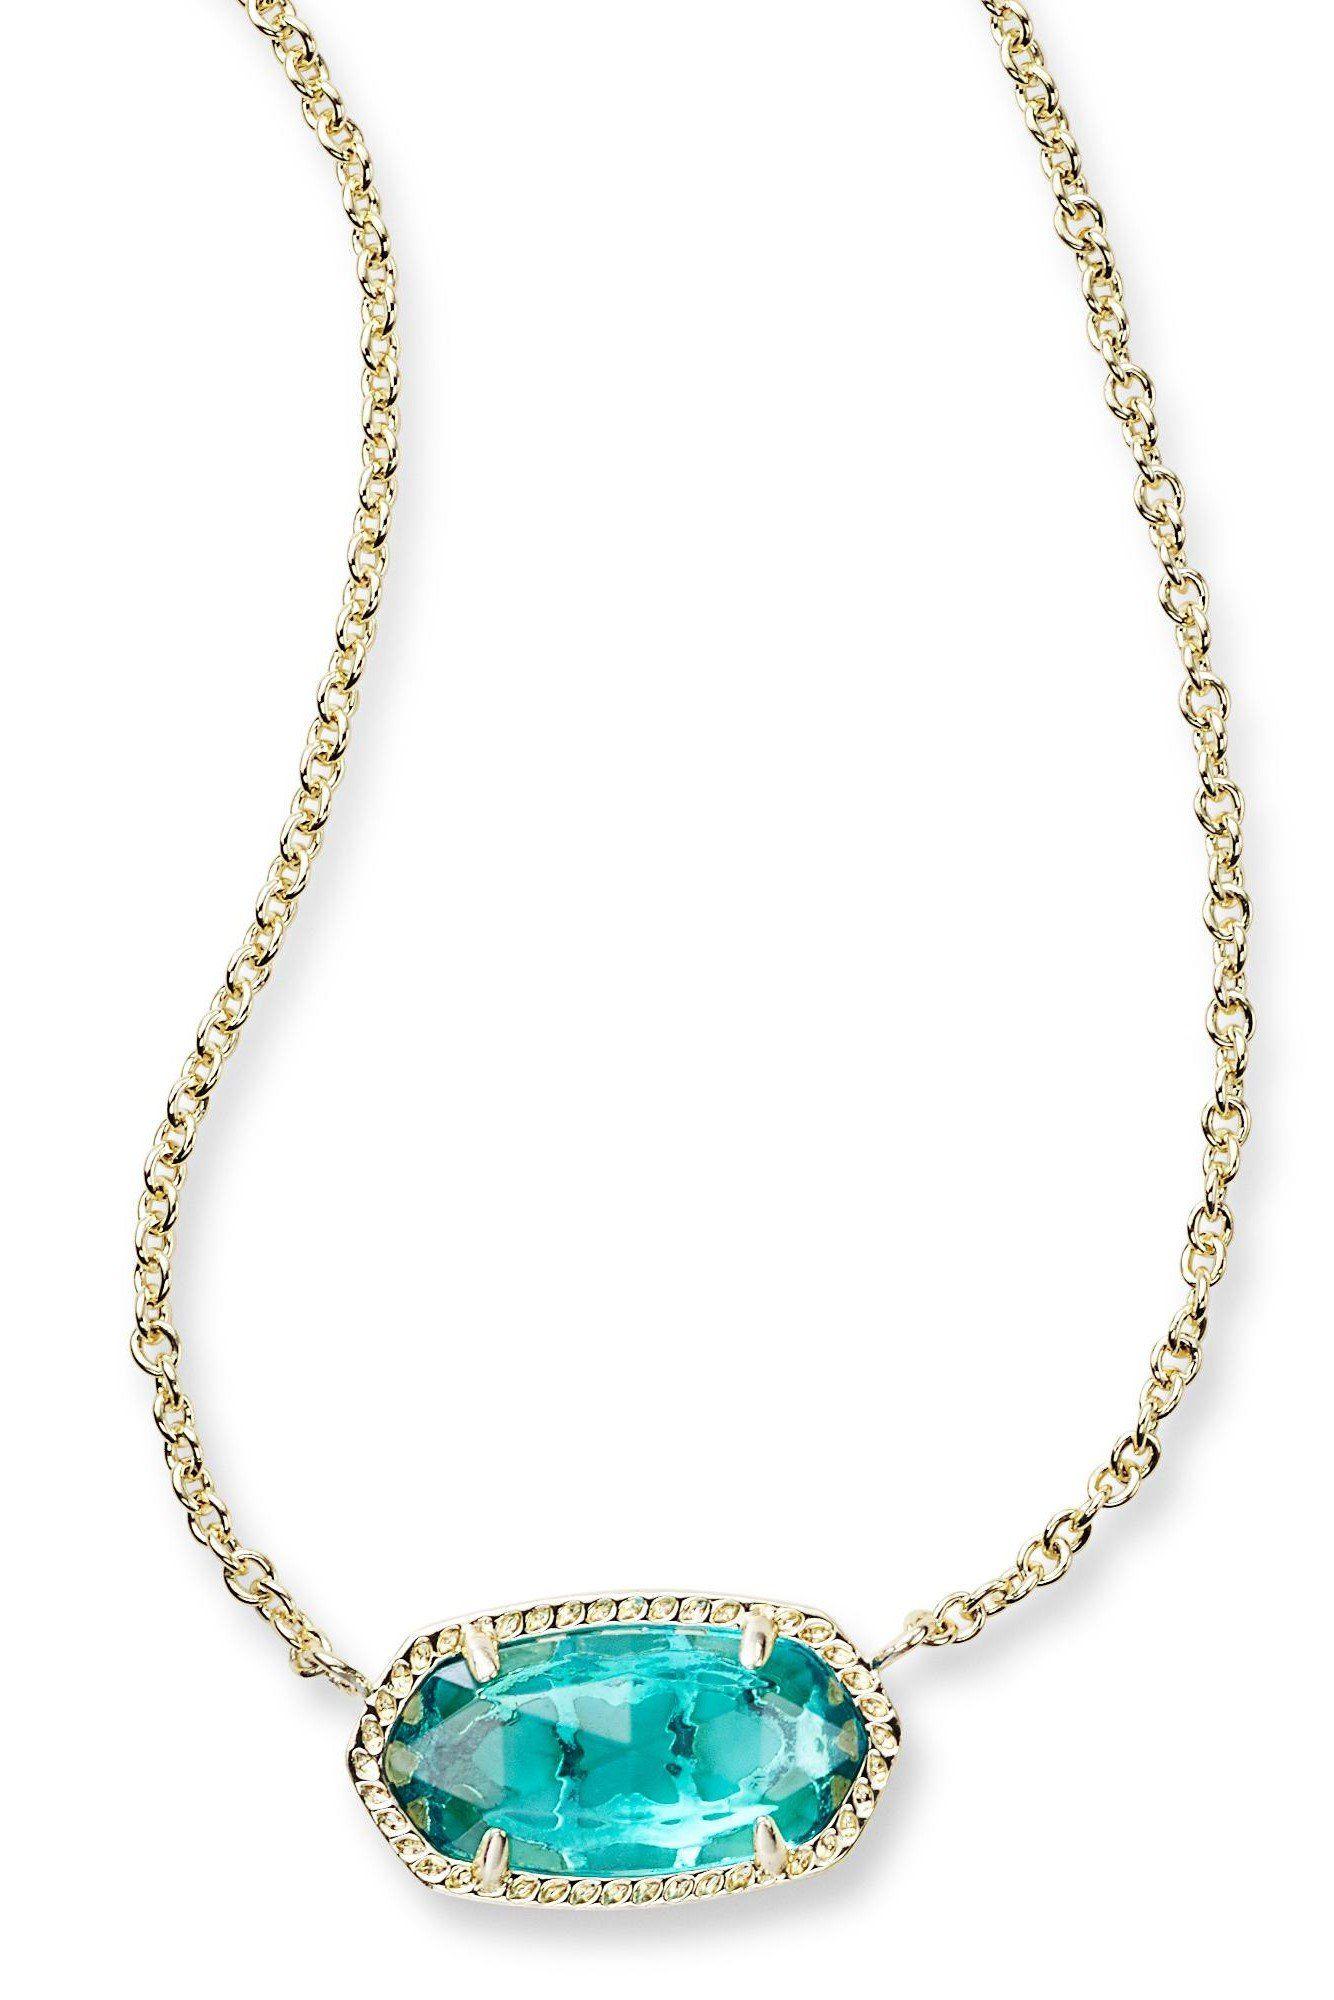 Kendra scot elisa pendant necklace in london blue london blue